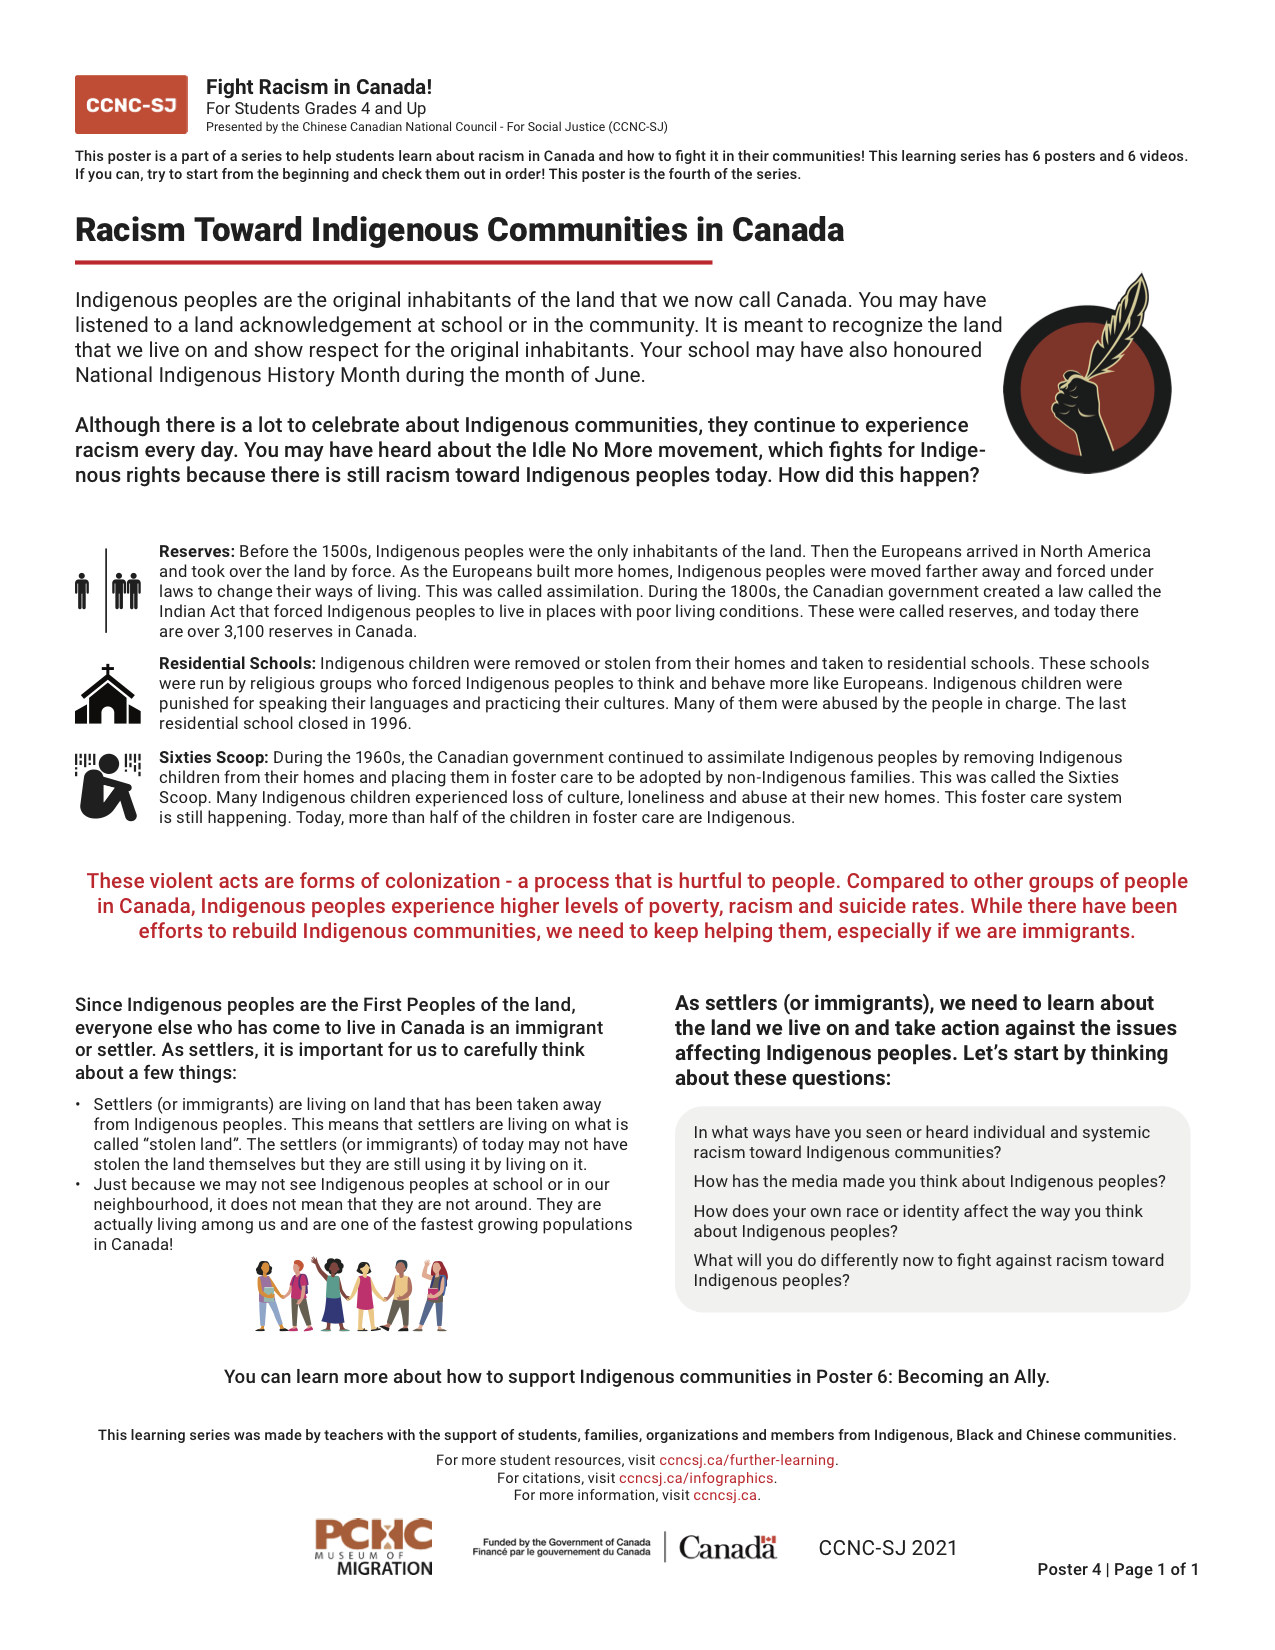 CCNCSJ-Student Resource-Poster 4